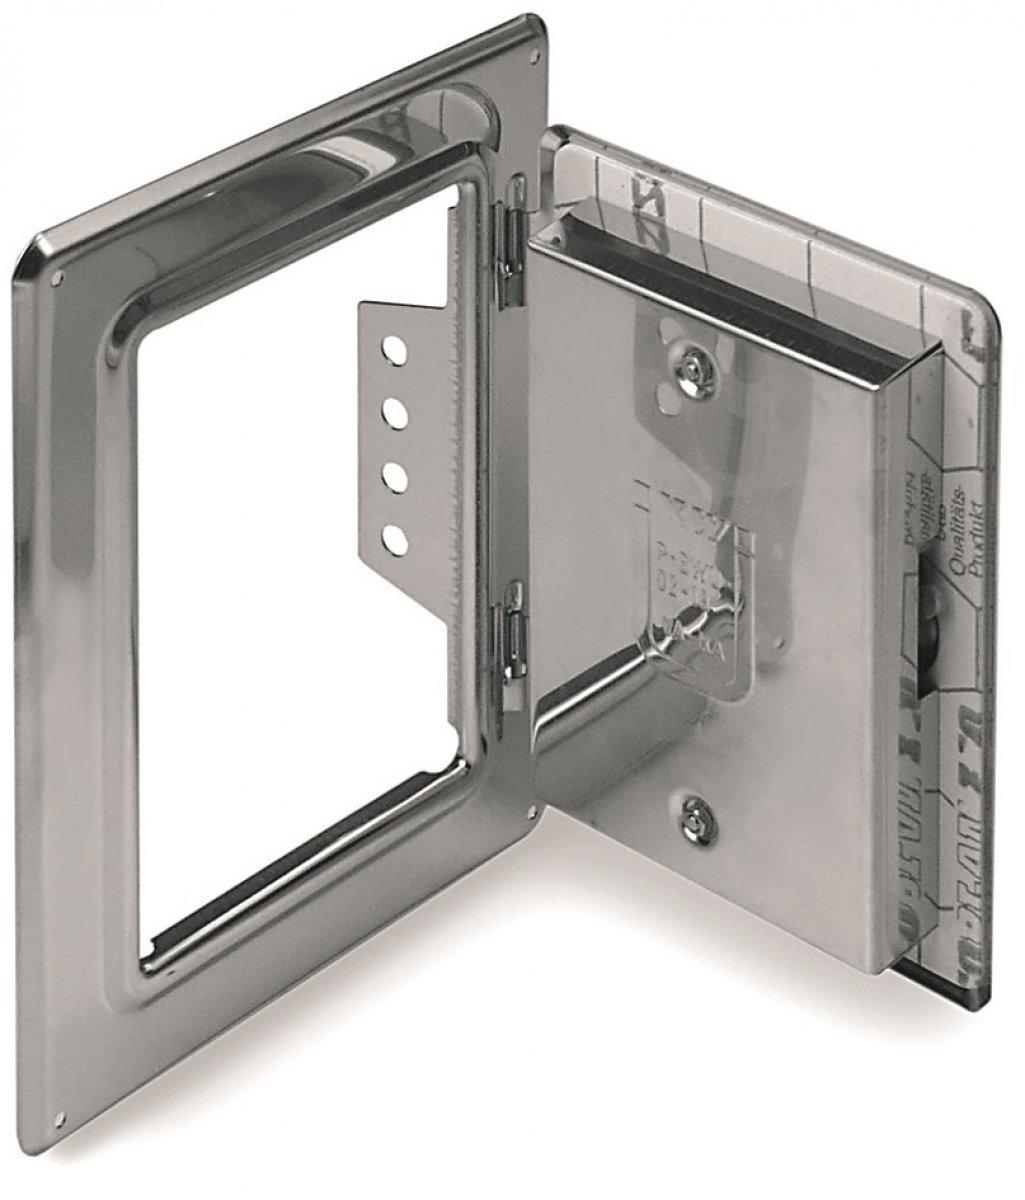 Schoorsteendeur van roestvrijstaal 210 mm x 140 mm met 60 mm kliksluiting - enkelwandig voor Tecnovis TEC-EW-Classic